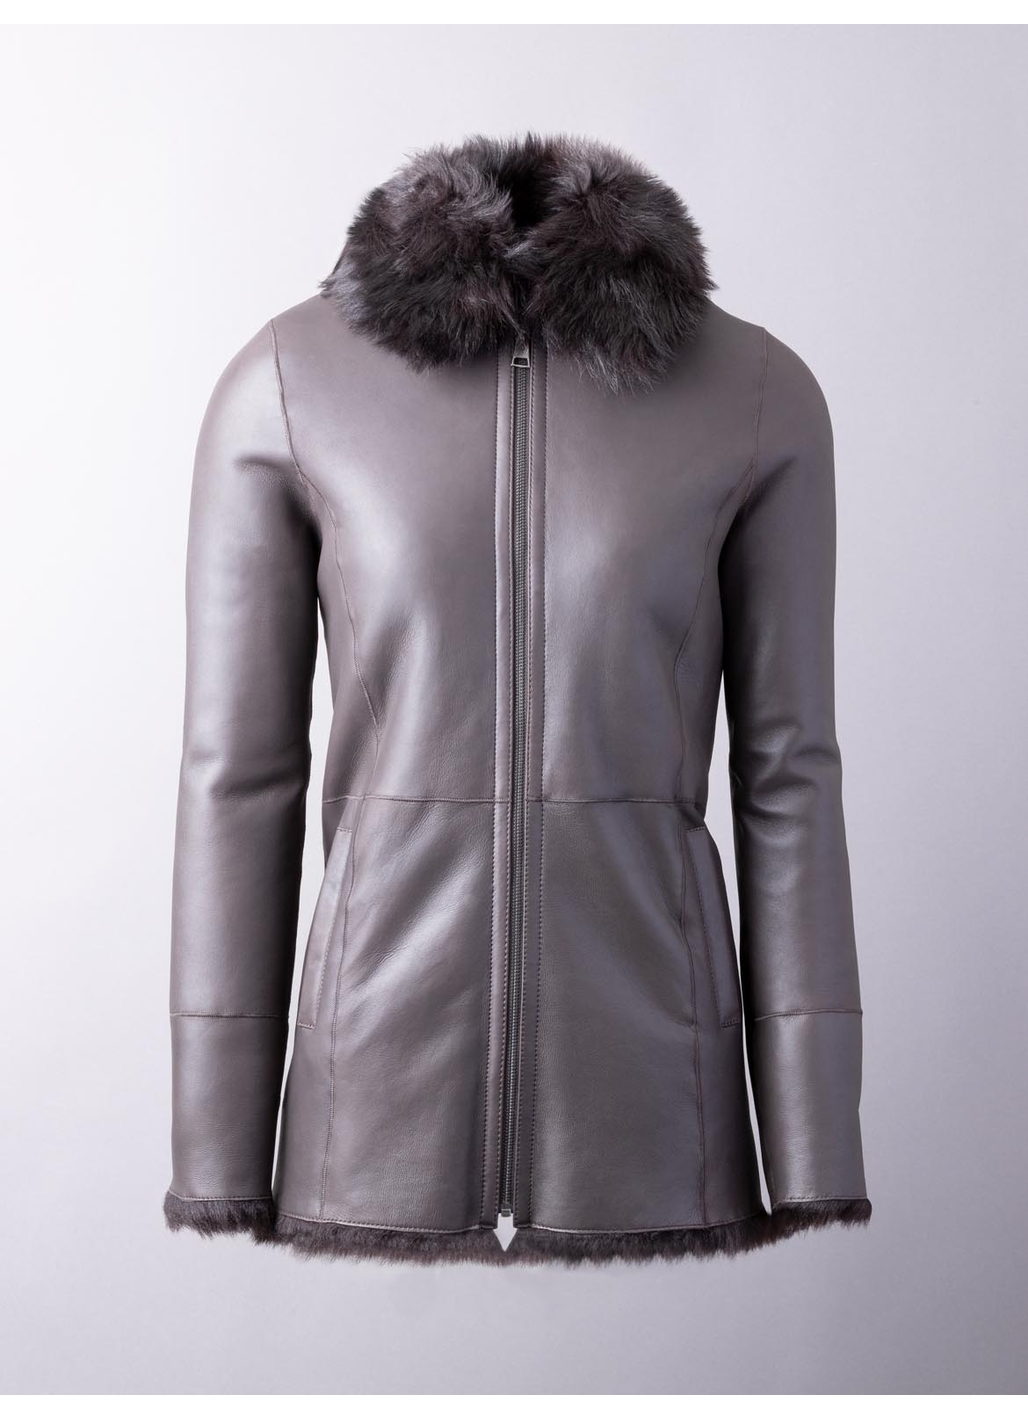 Coniston Sheepskin Coat in Dark Brown